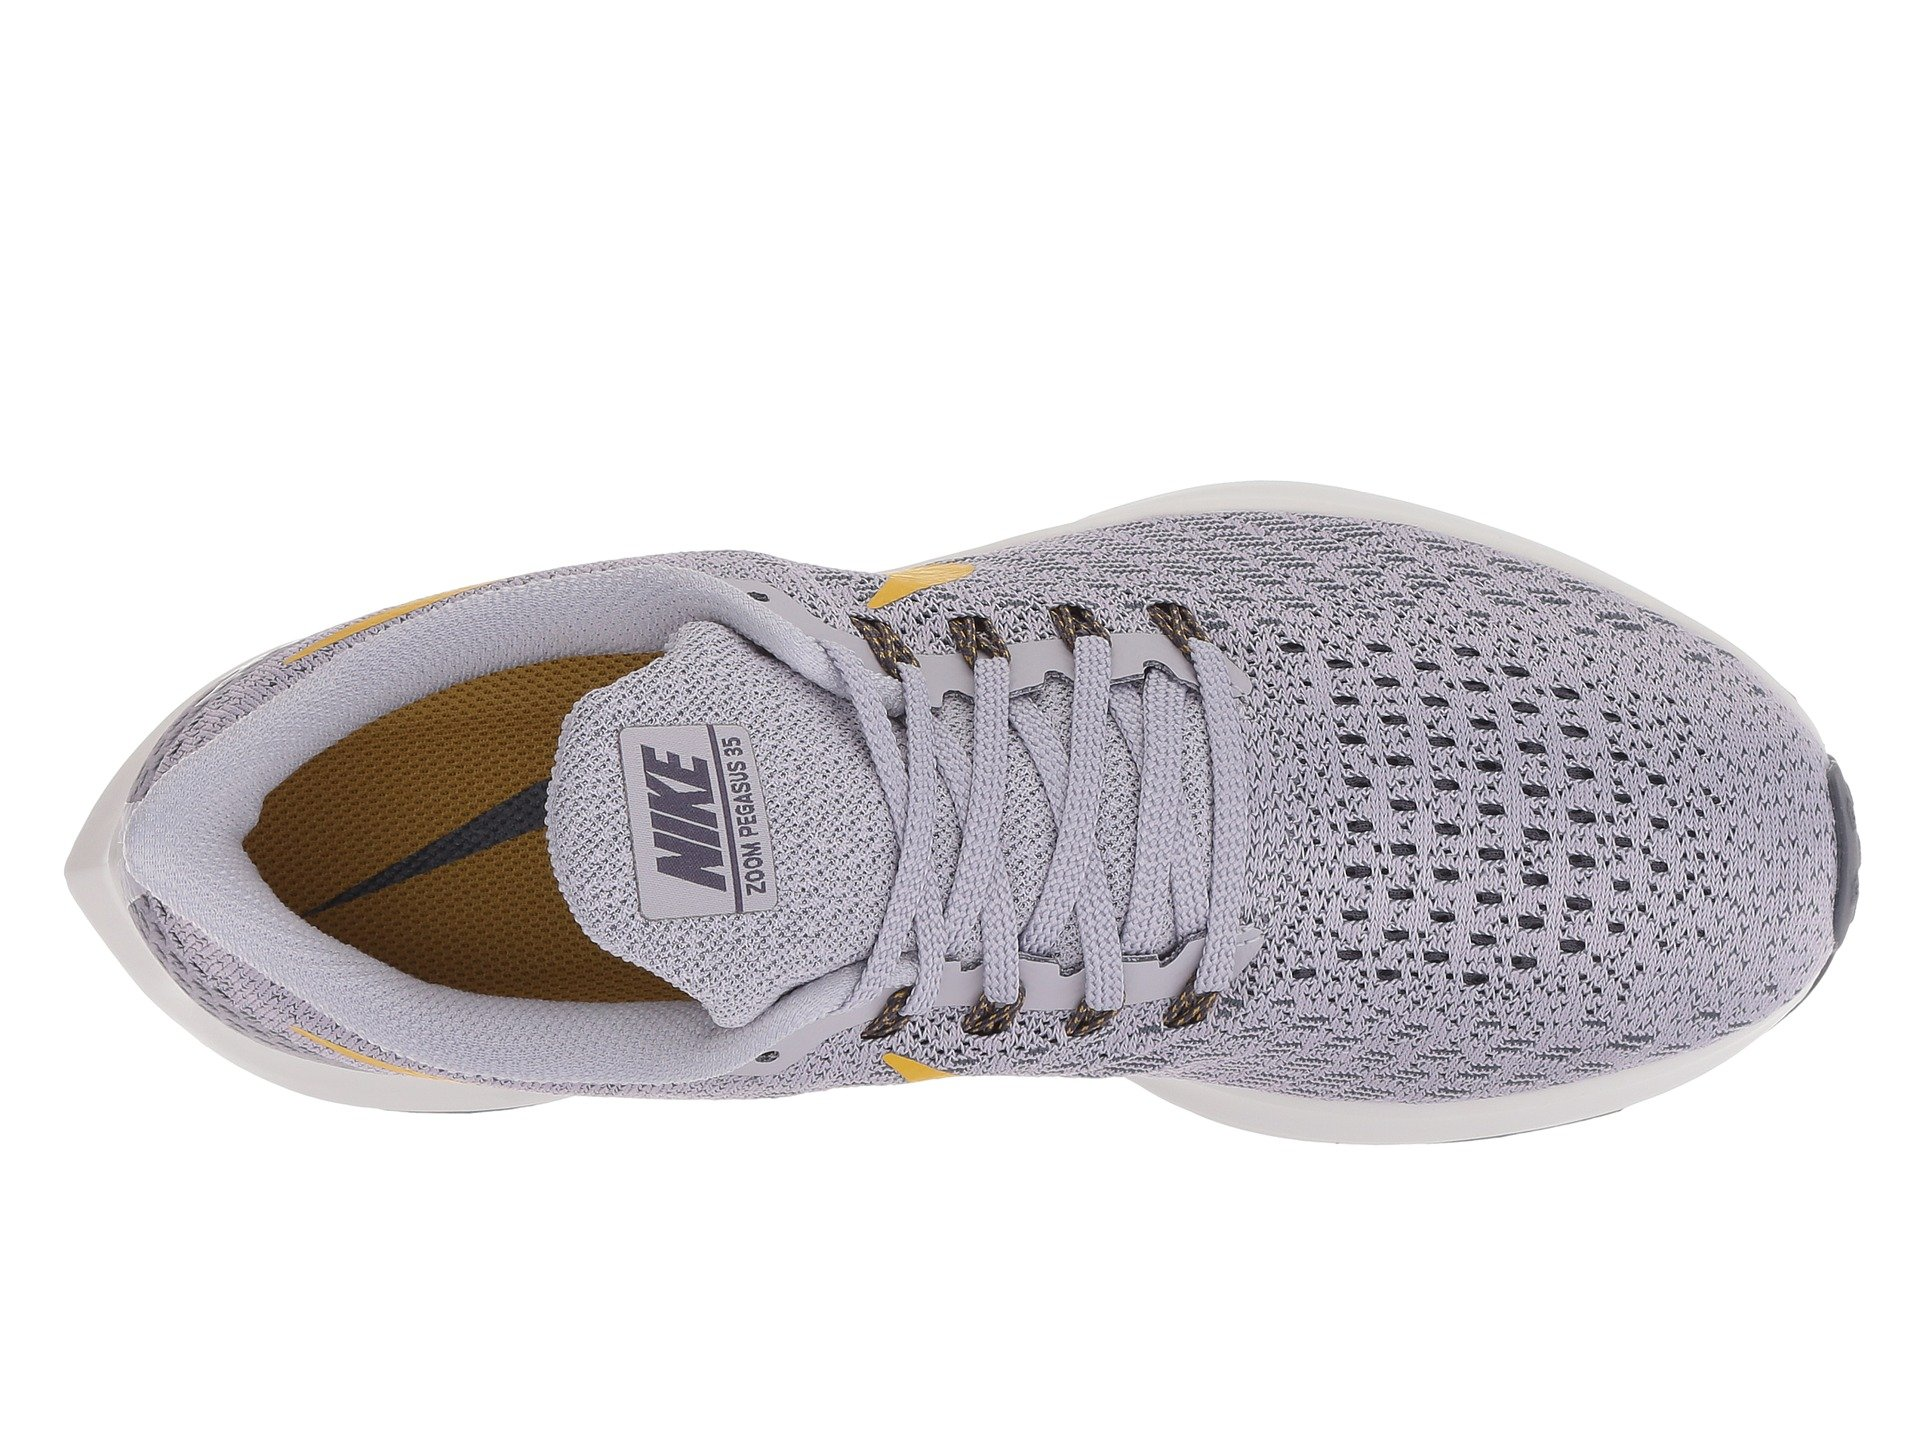 Nike WMNS Air Zoom Pegasus 35 Womens 942855-500 Size 5 by Nike (Image #9)